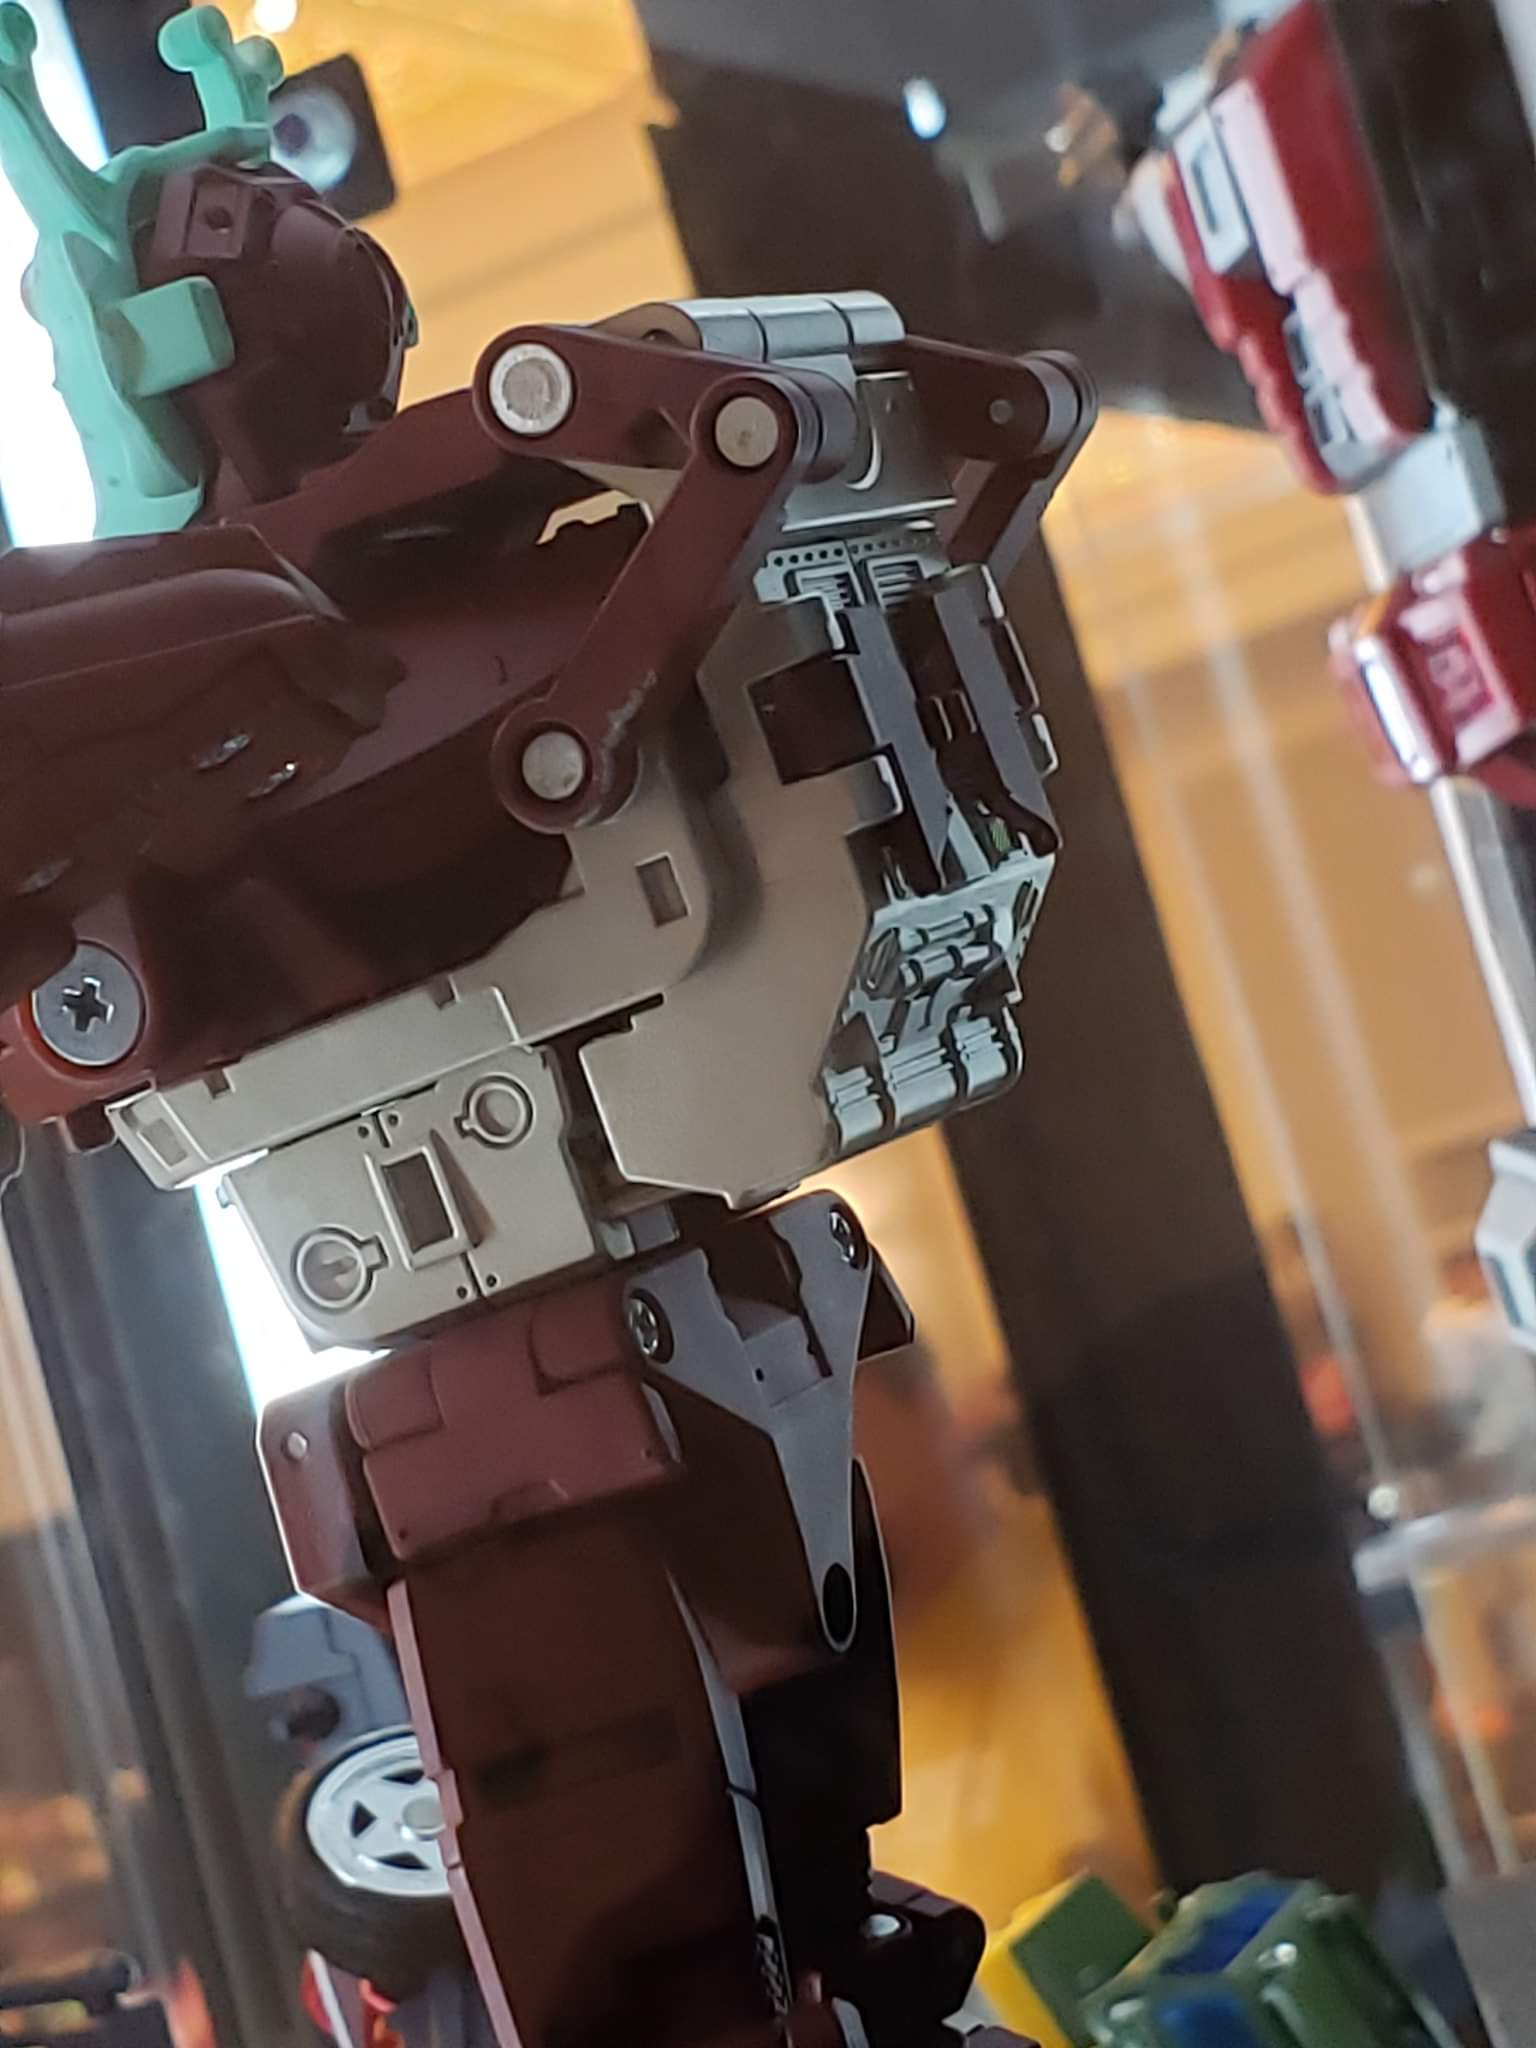 [Fanstoys] Produit Tiers - Minibots MP - Gamme FT - Page 4 67f8HOdx_o